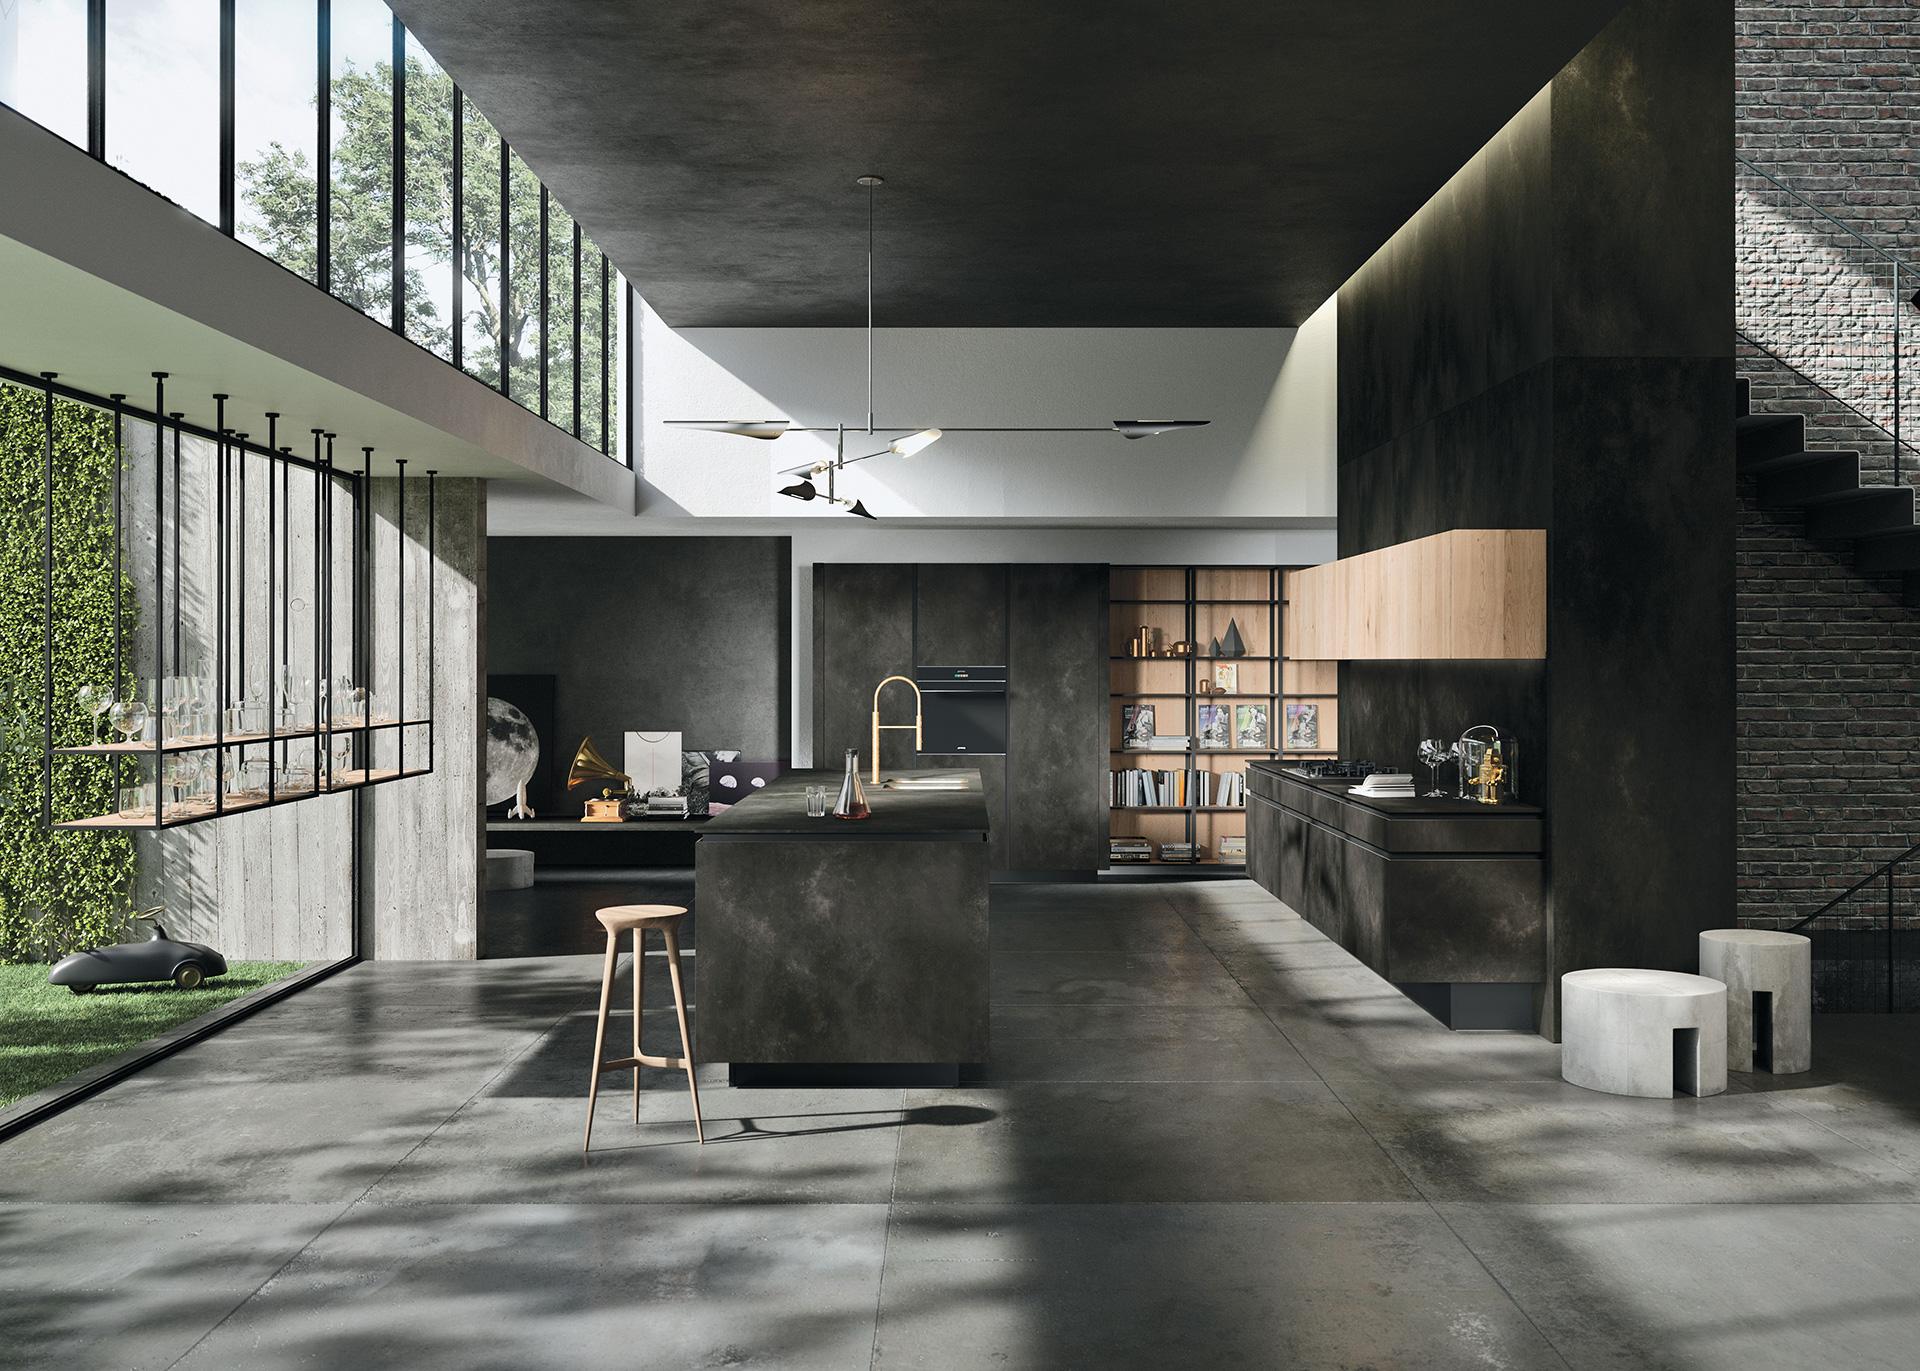 cucina-Way-ceramica-ossido-nero-1